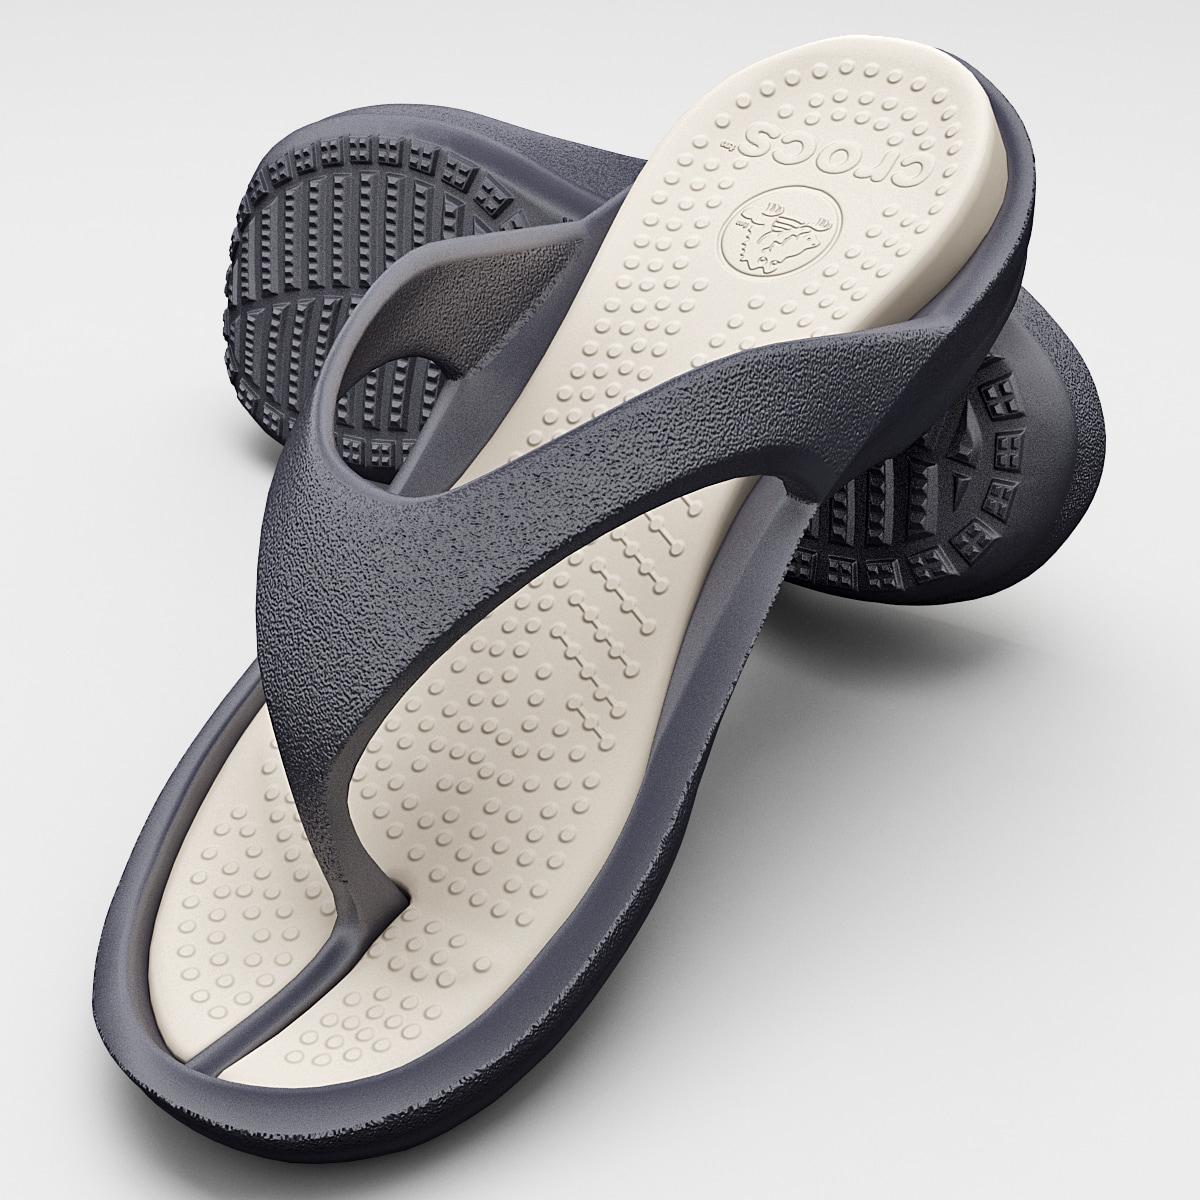 Sandals_Crocs_0001.jpg